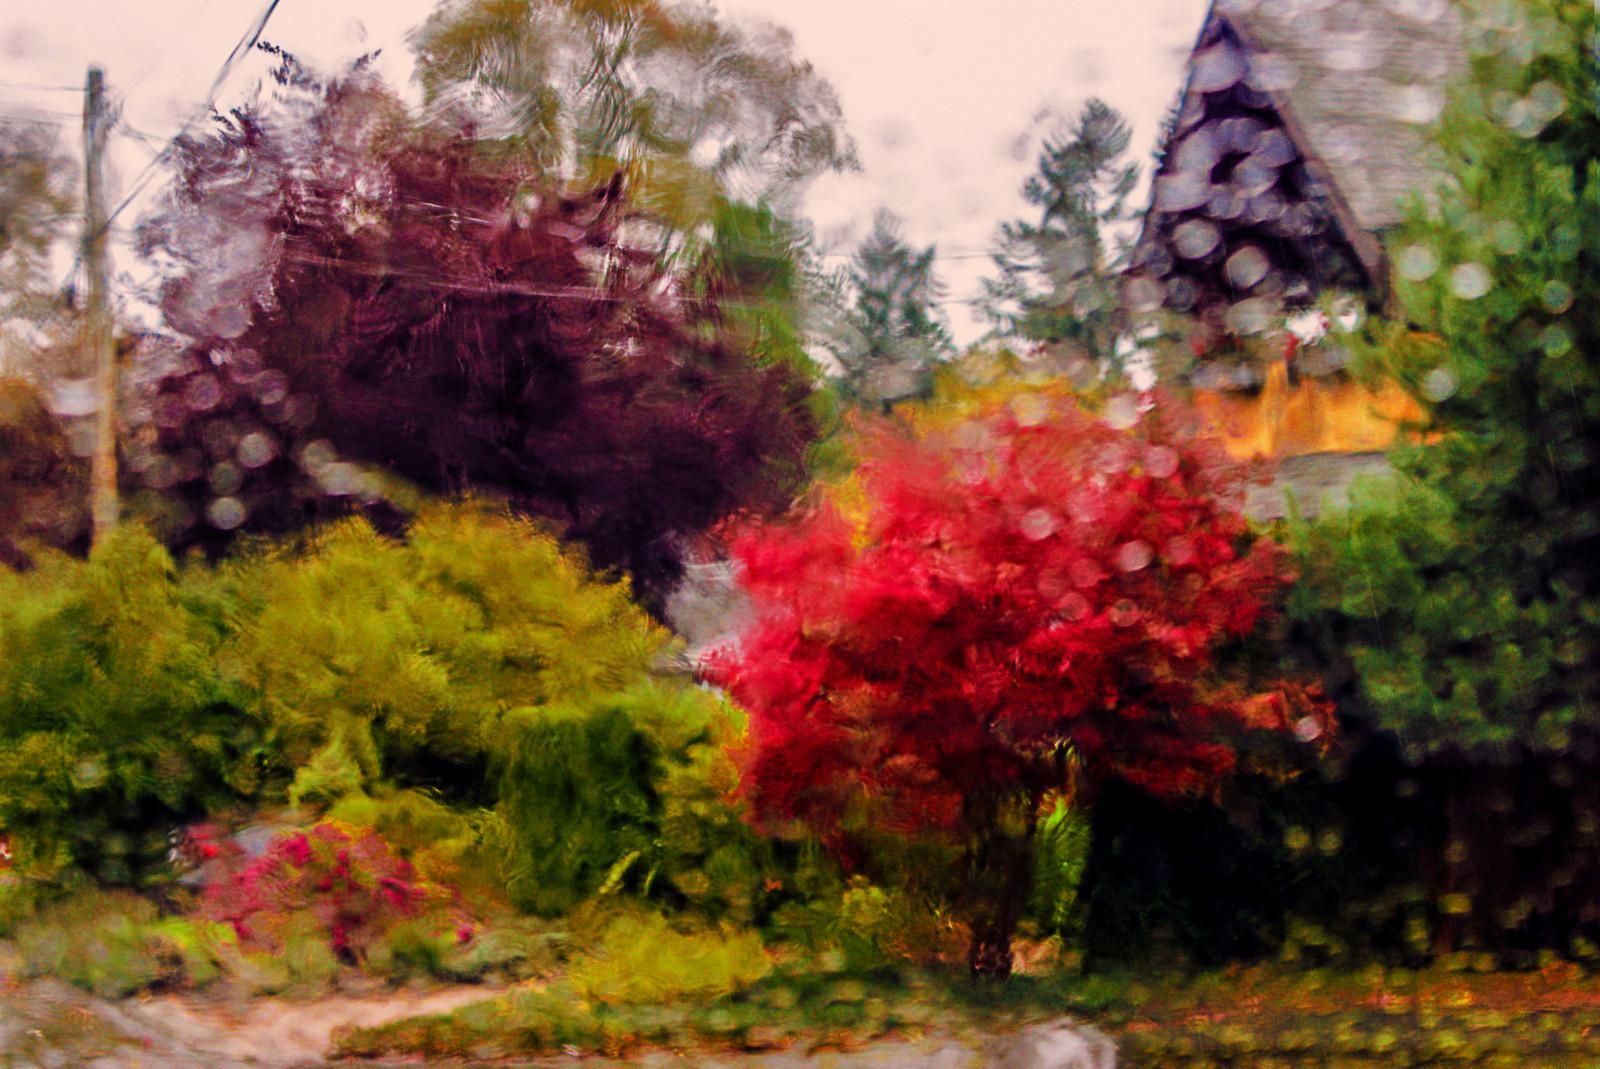 Fondos de pantalla rboles pintura oto o jard n for Arbol rojo jardin